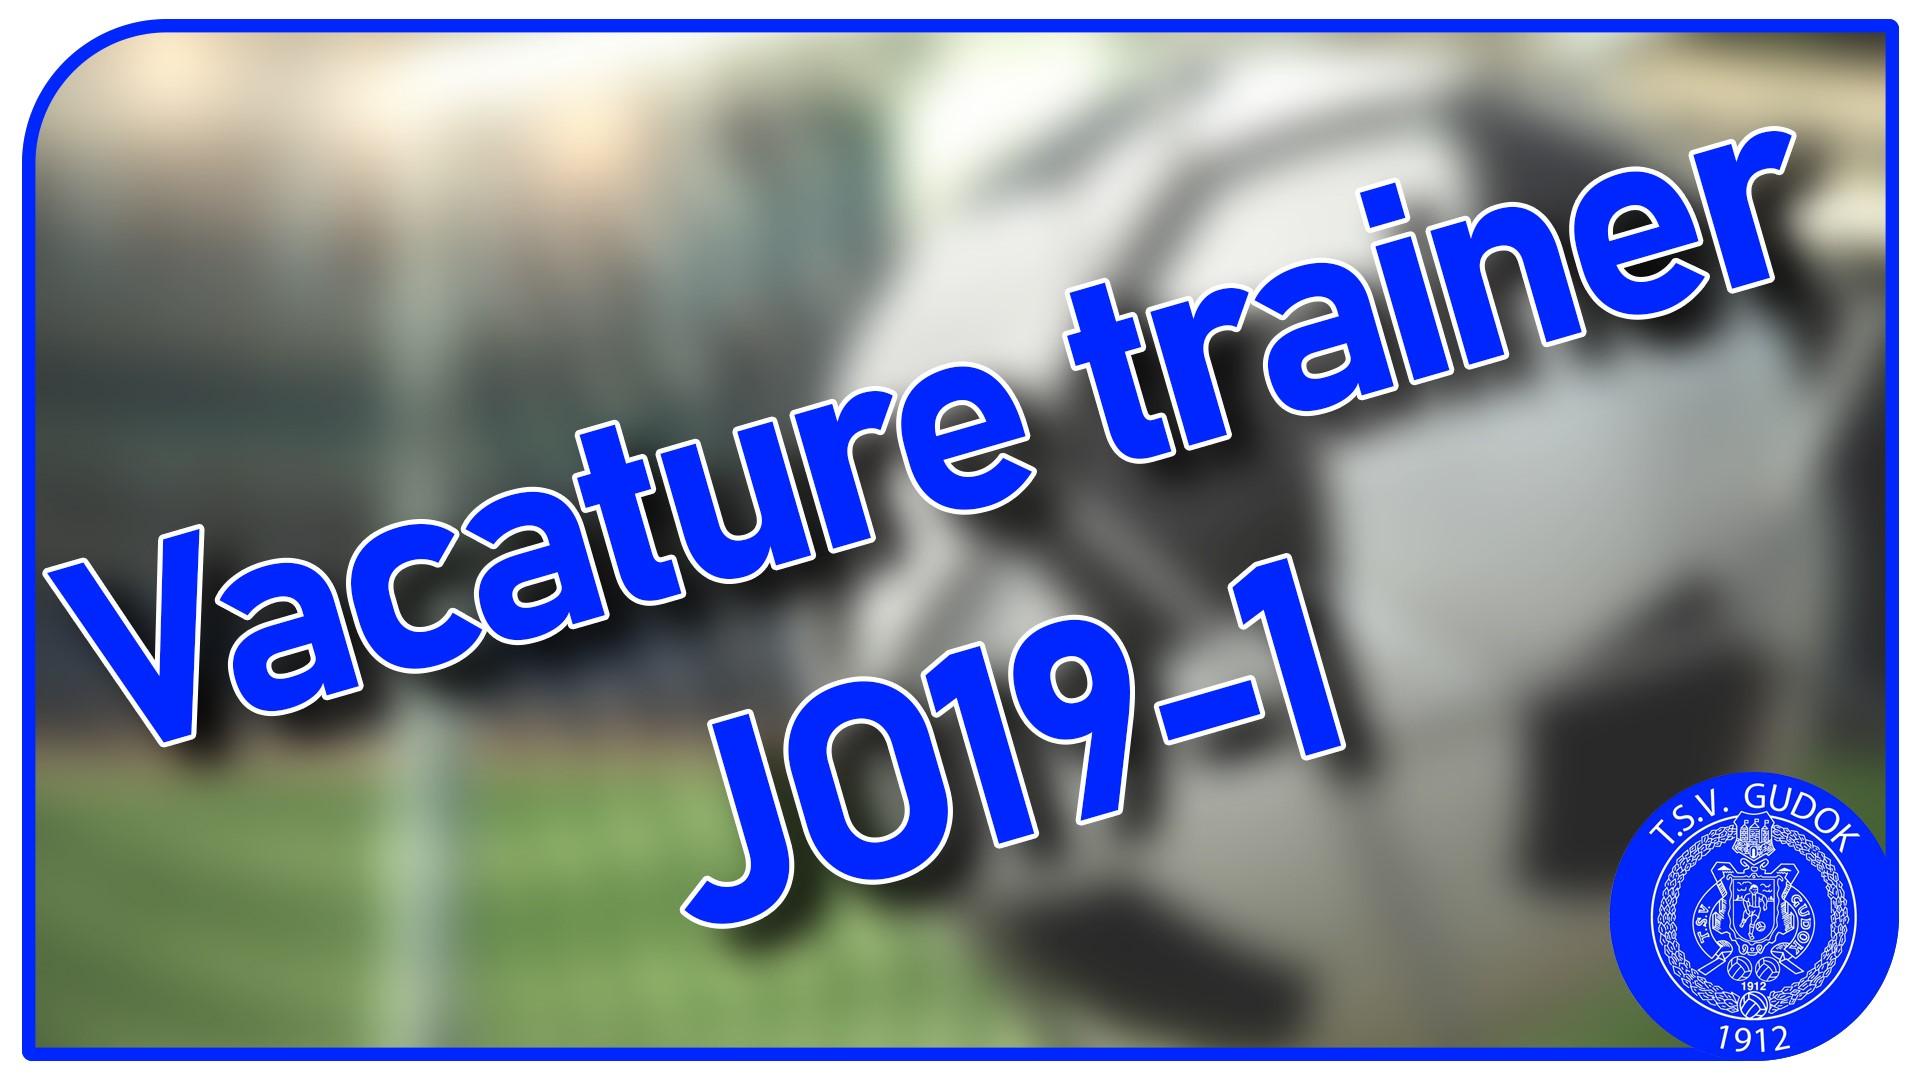 Vacature trainer JO19-1